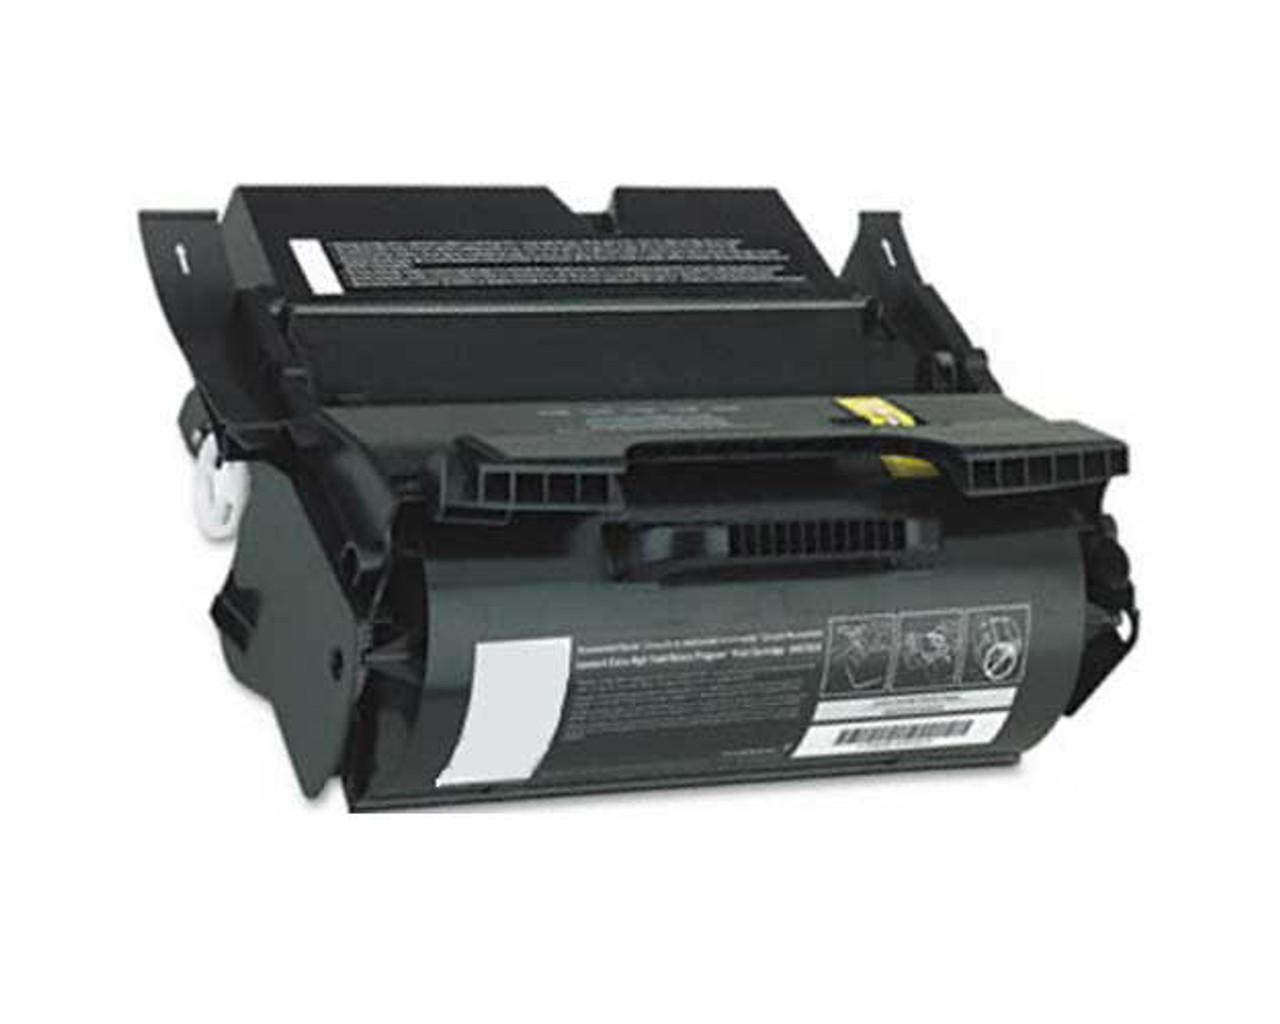 Lexmark MX810/MX811 High Yield Toner Cartridge - New compatible